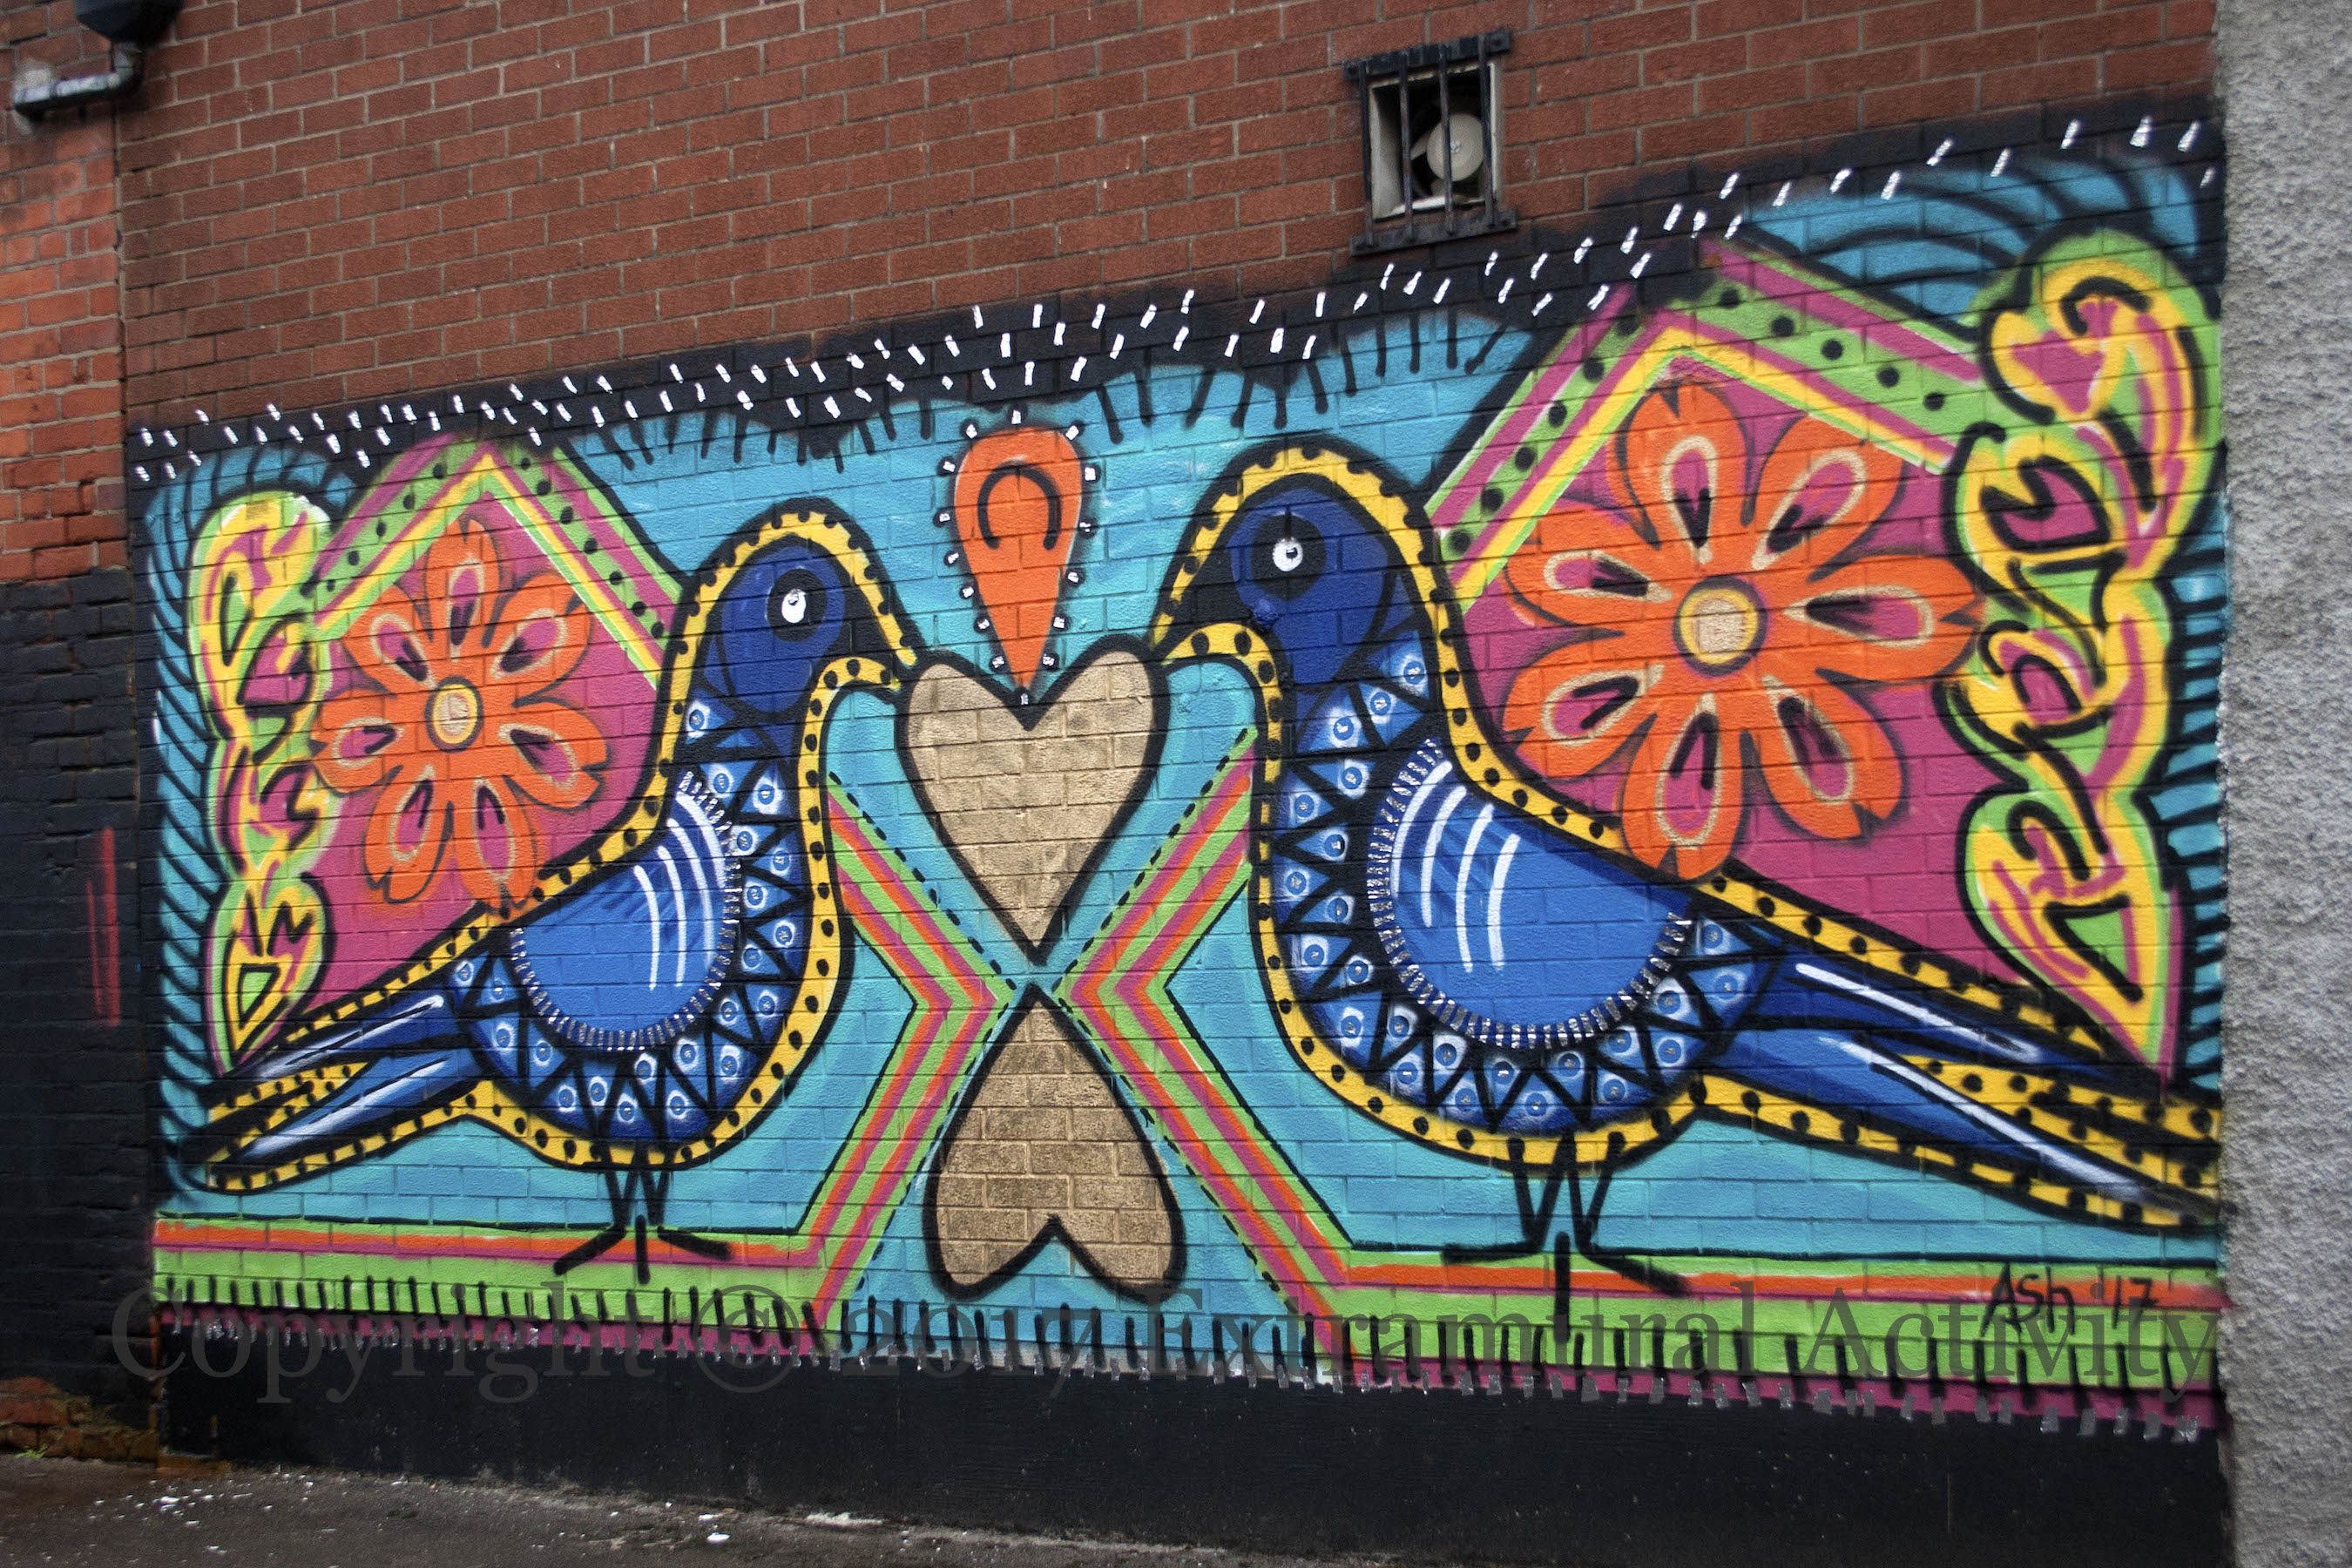 Graffiti wall activity - 04368 2017 08 08 Ash Birds